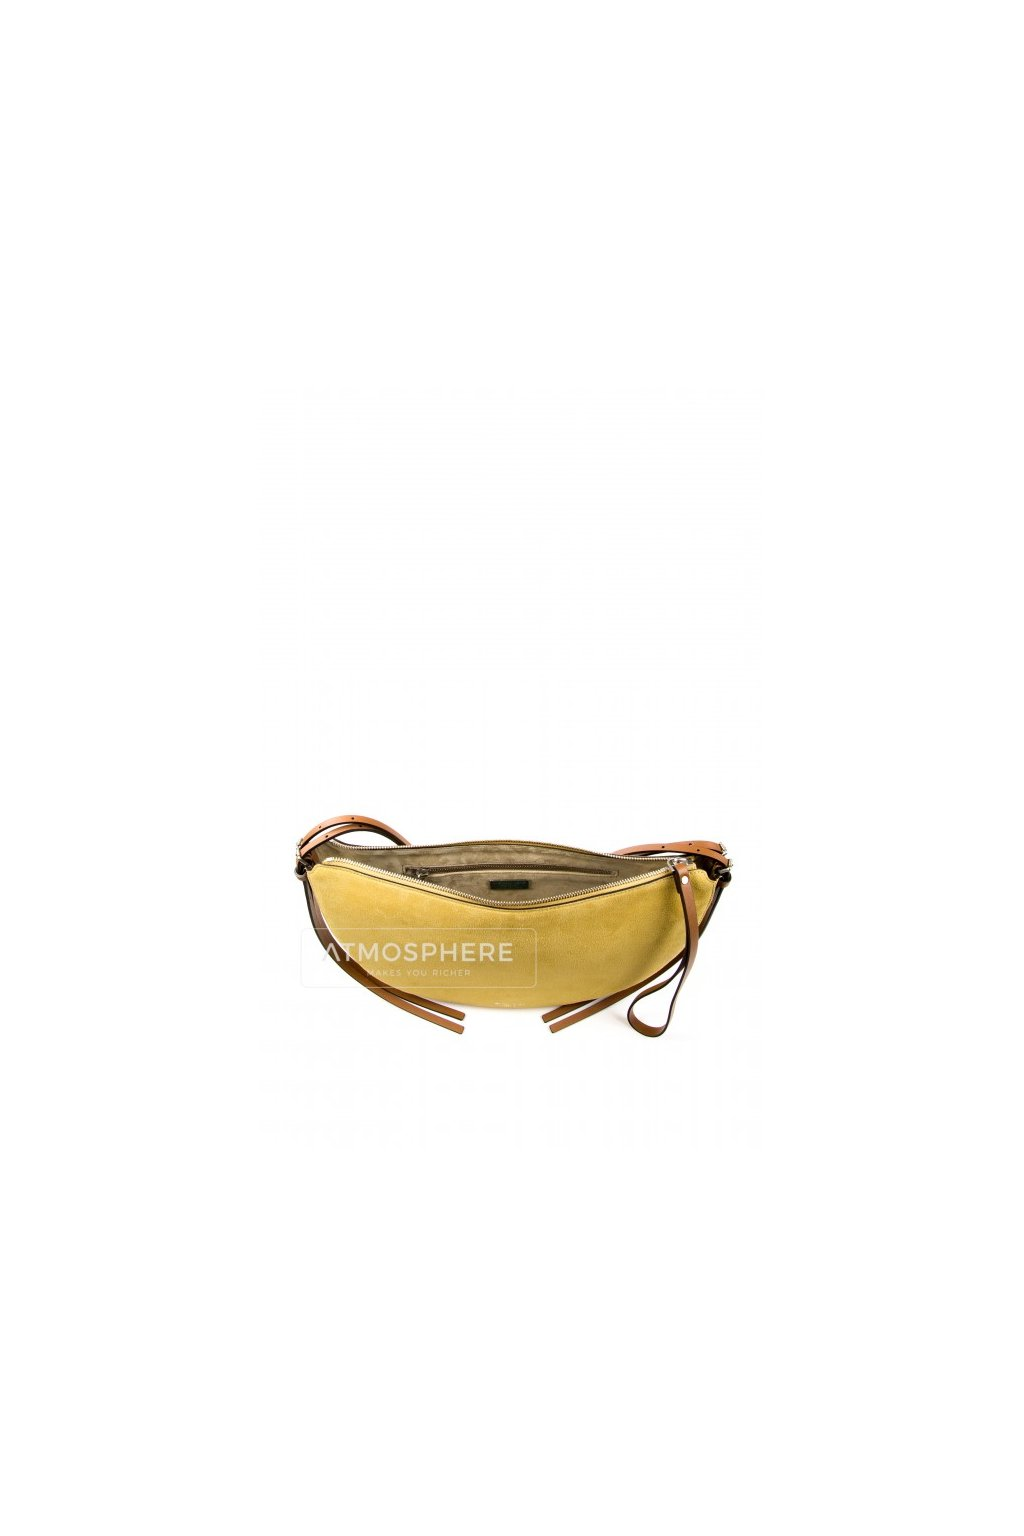 ... 1 · kabelka michael kors sedona medium leather shoulder bag butter  eshopat cz 2 ... 1fd497b93ce